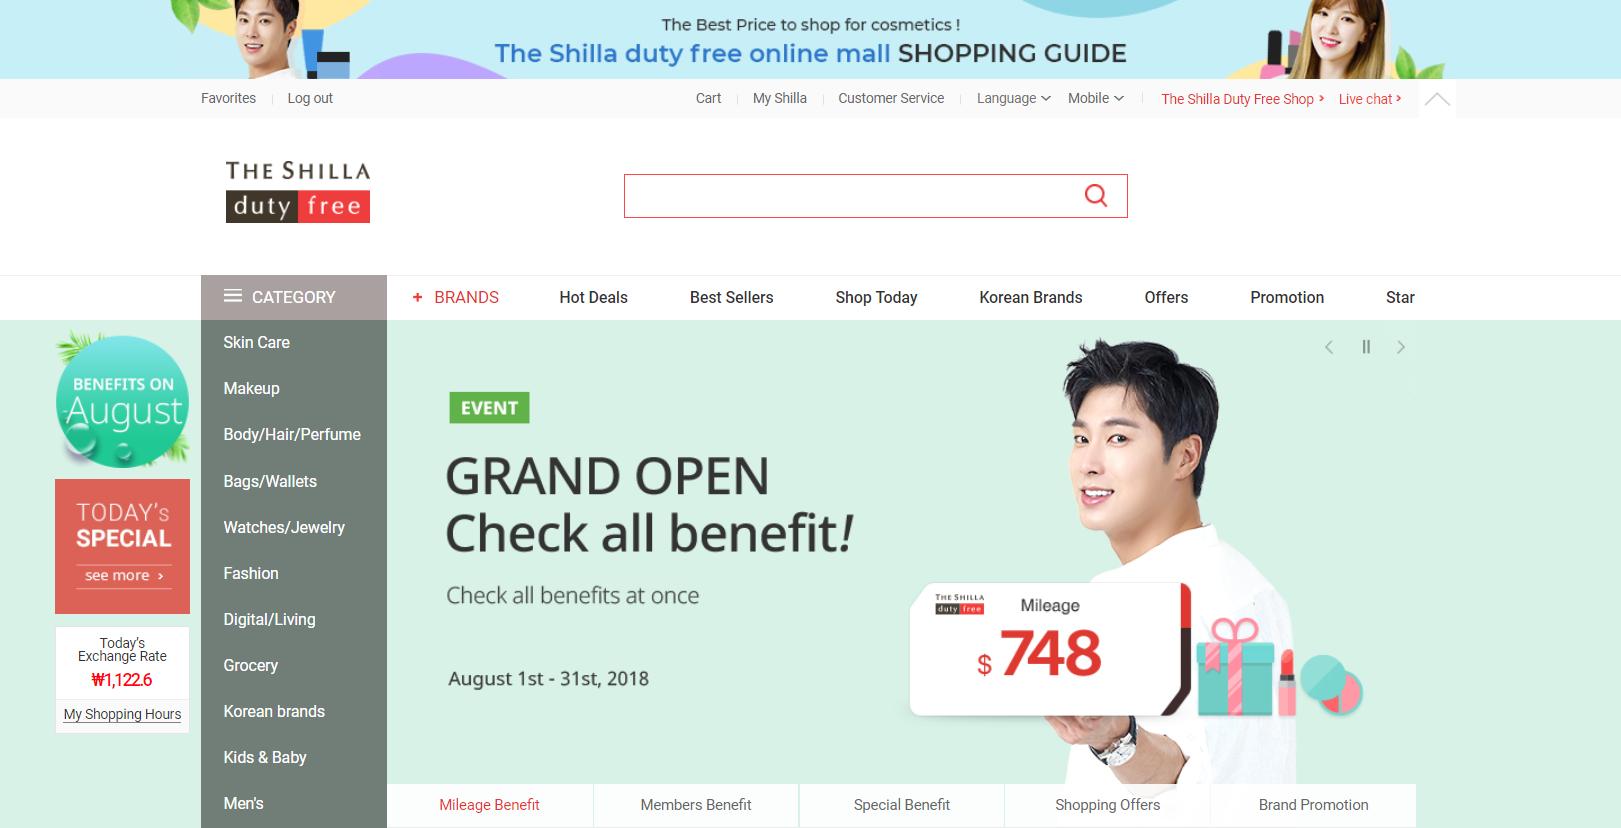 The Shilla Duty Free Online Mall